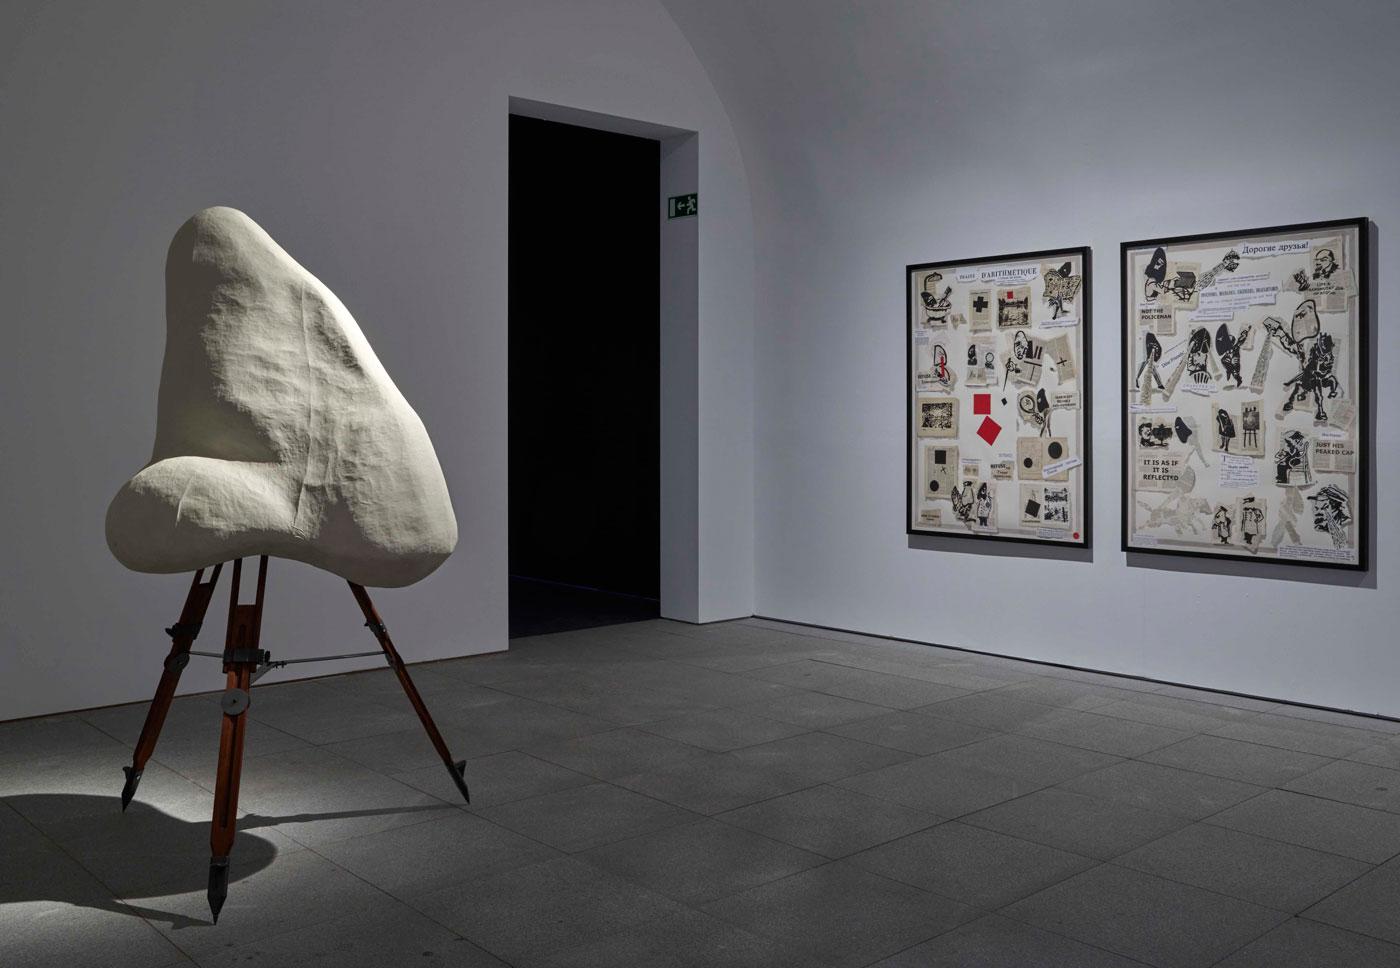 Basta y Sobra | View - The nose (2009) | Photo © Joaquin Cortes /Roman Lores